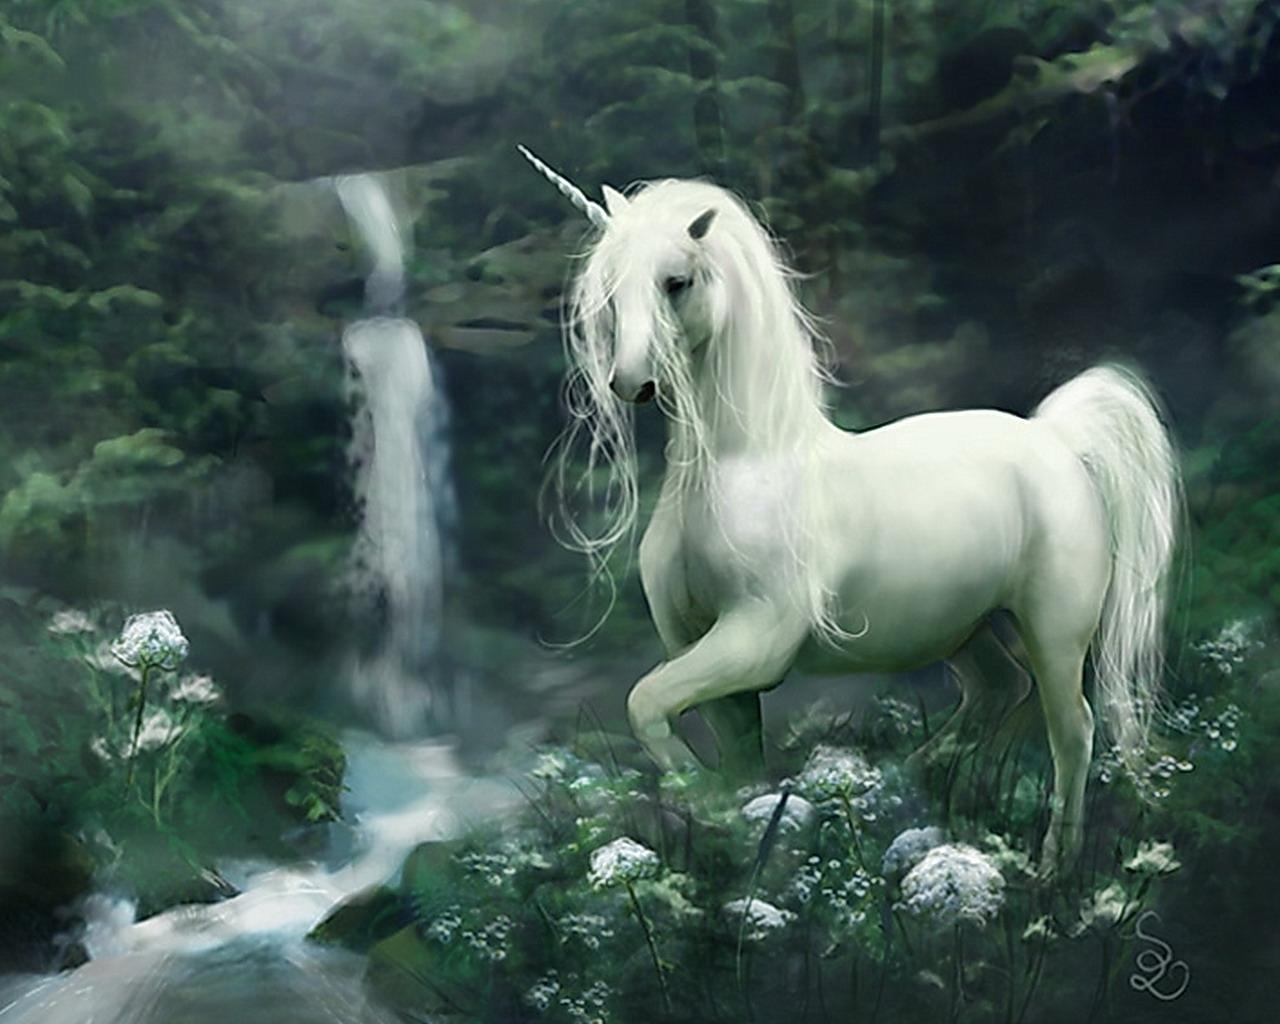 Unicorn Wallpaper wallpaper Unicorn Wallpaper hd wallpaper 1280x1024